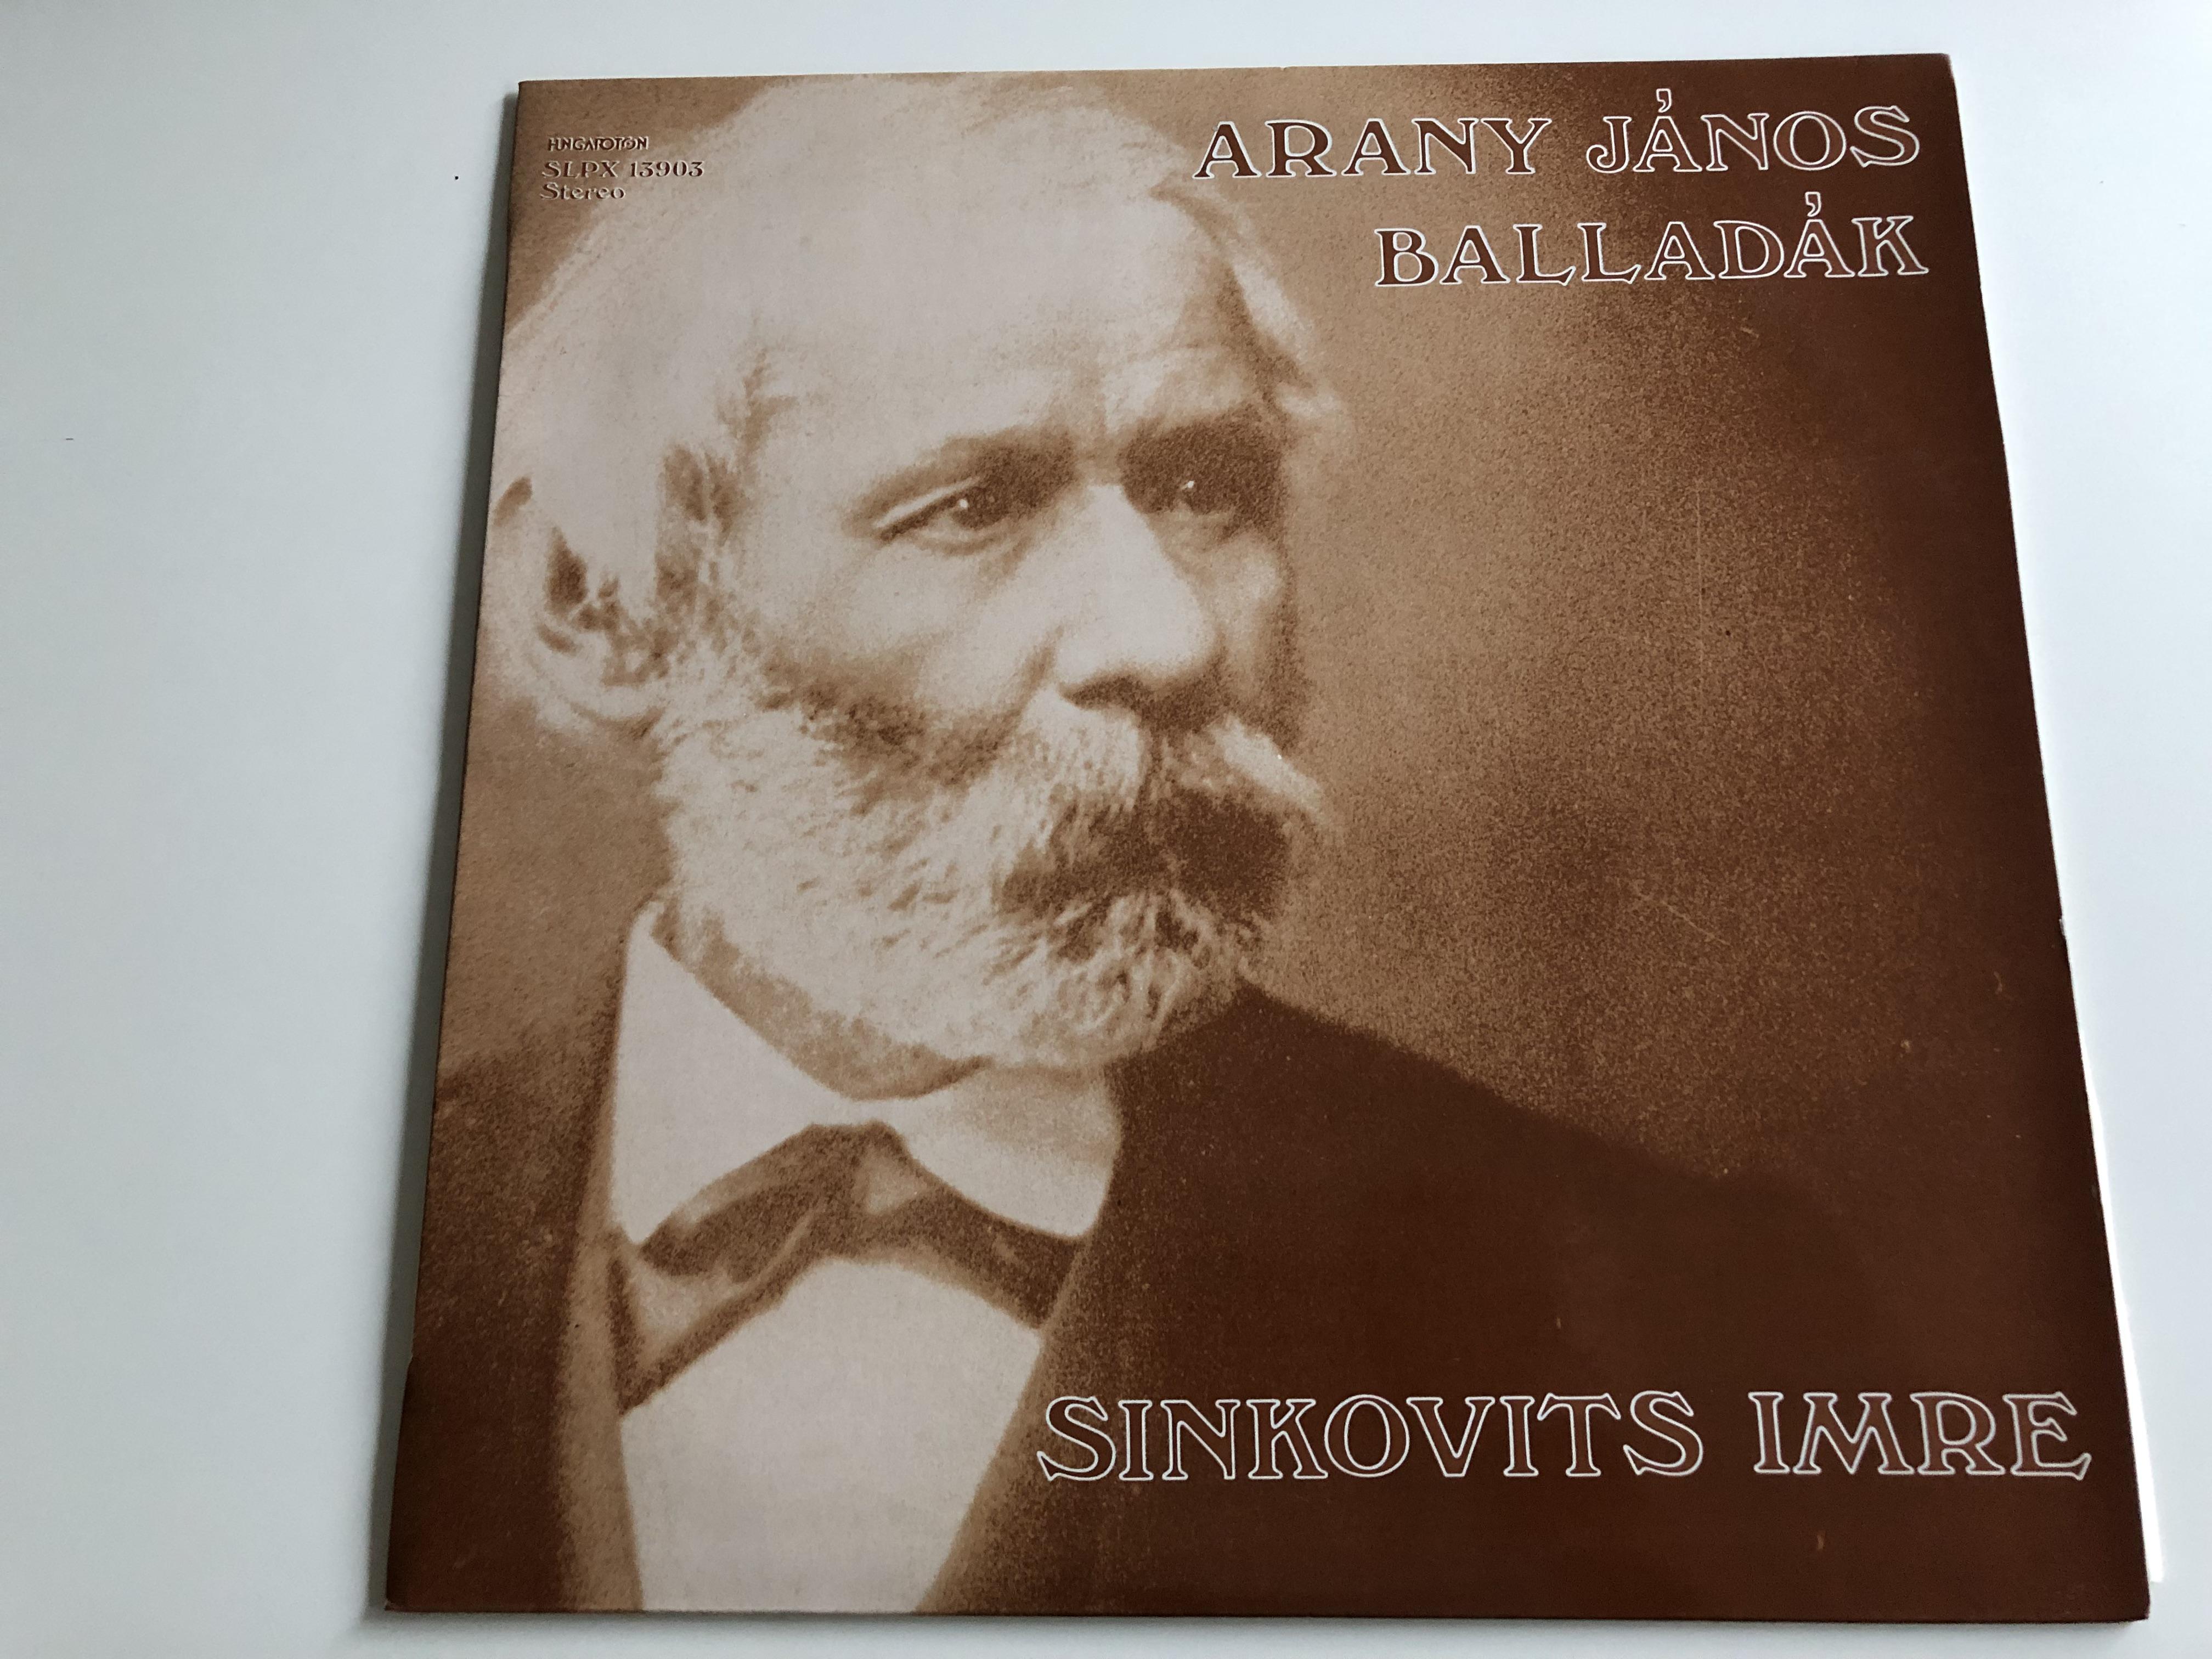 arany-j-nos-ballad-k-sinkovits-imre-hungaroton-lp-stereo-slpx-13903-1-.jpg